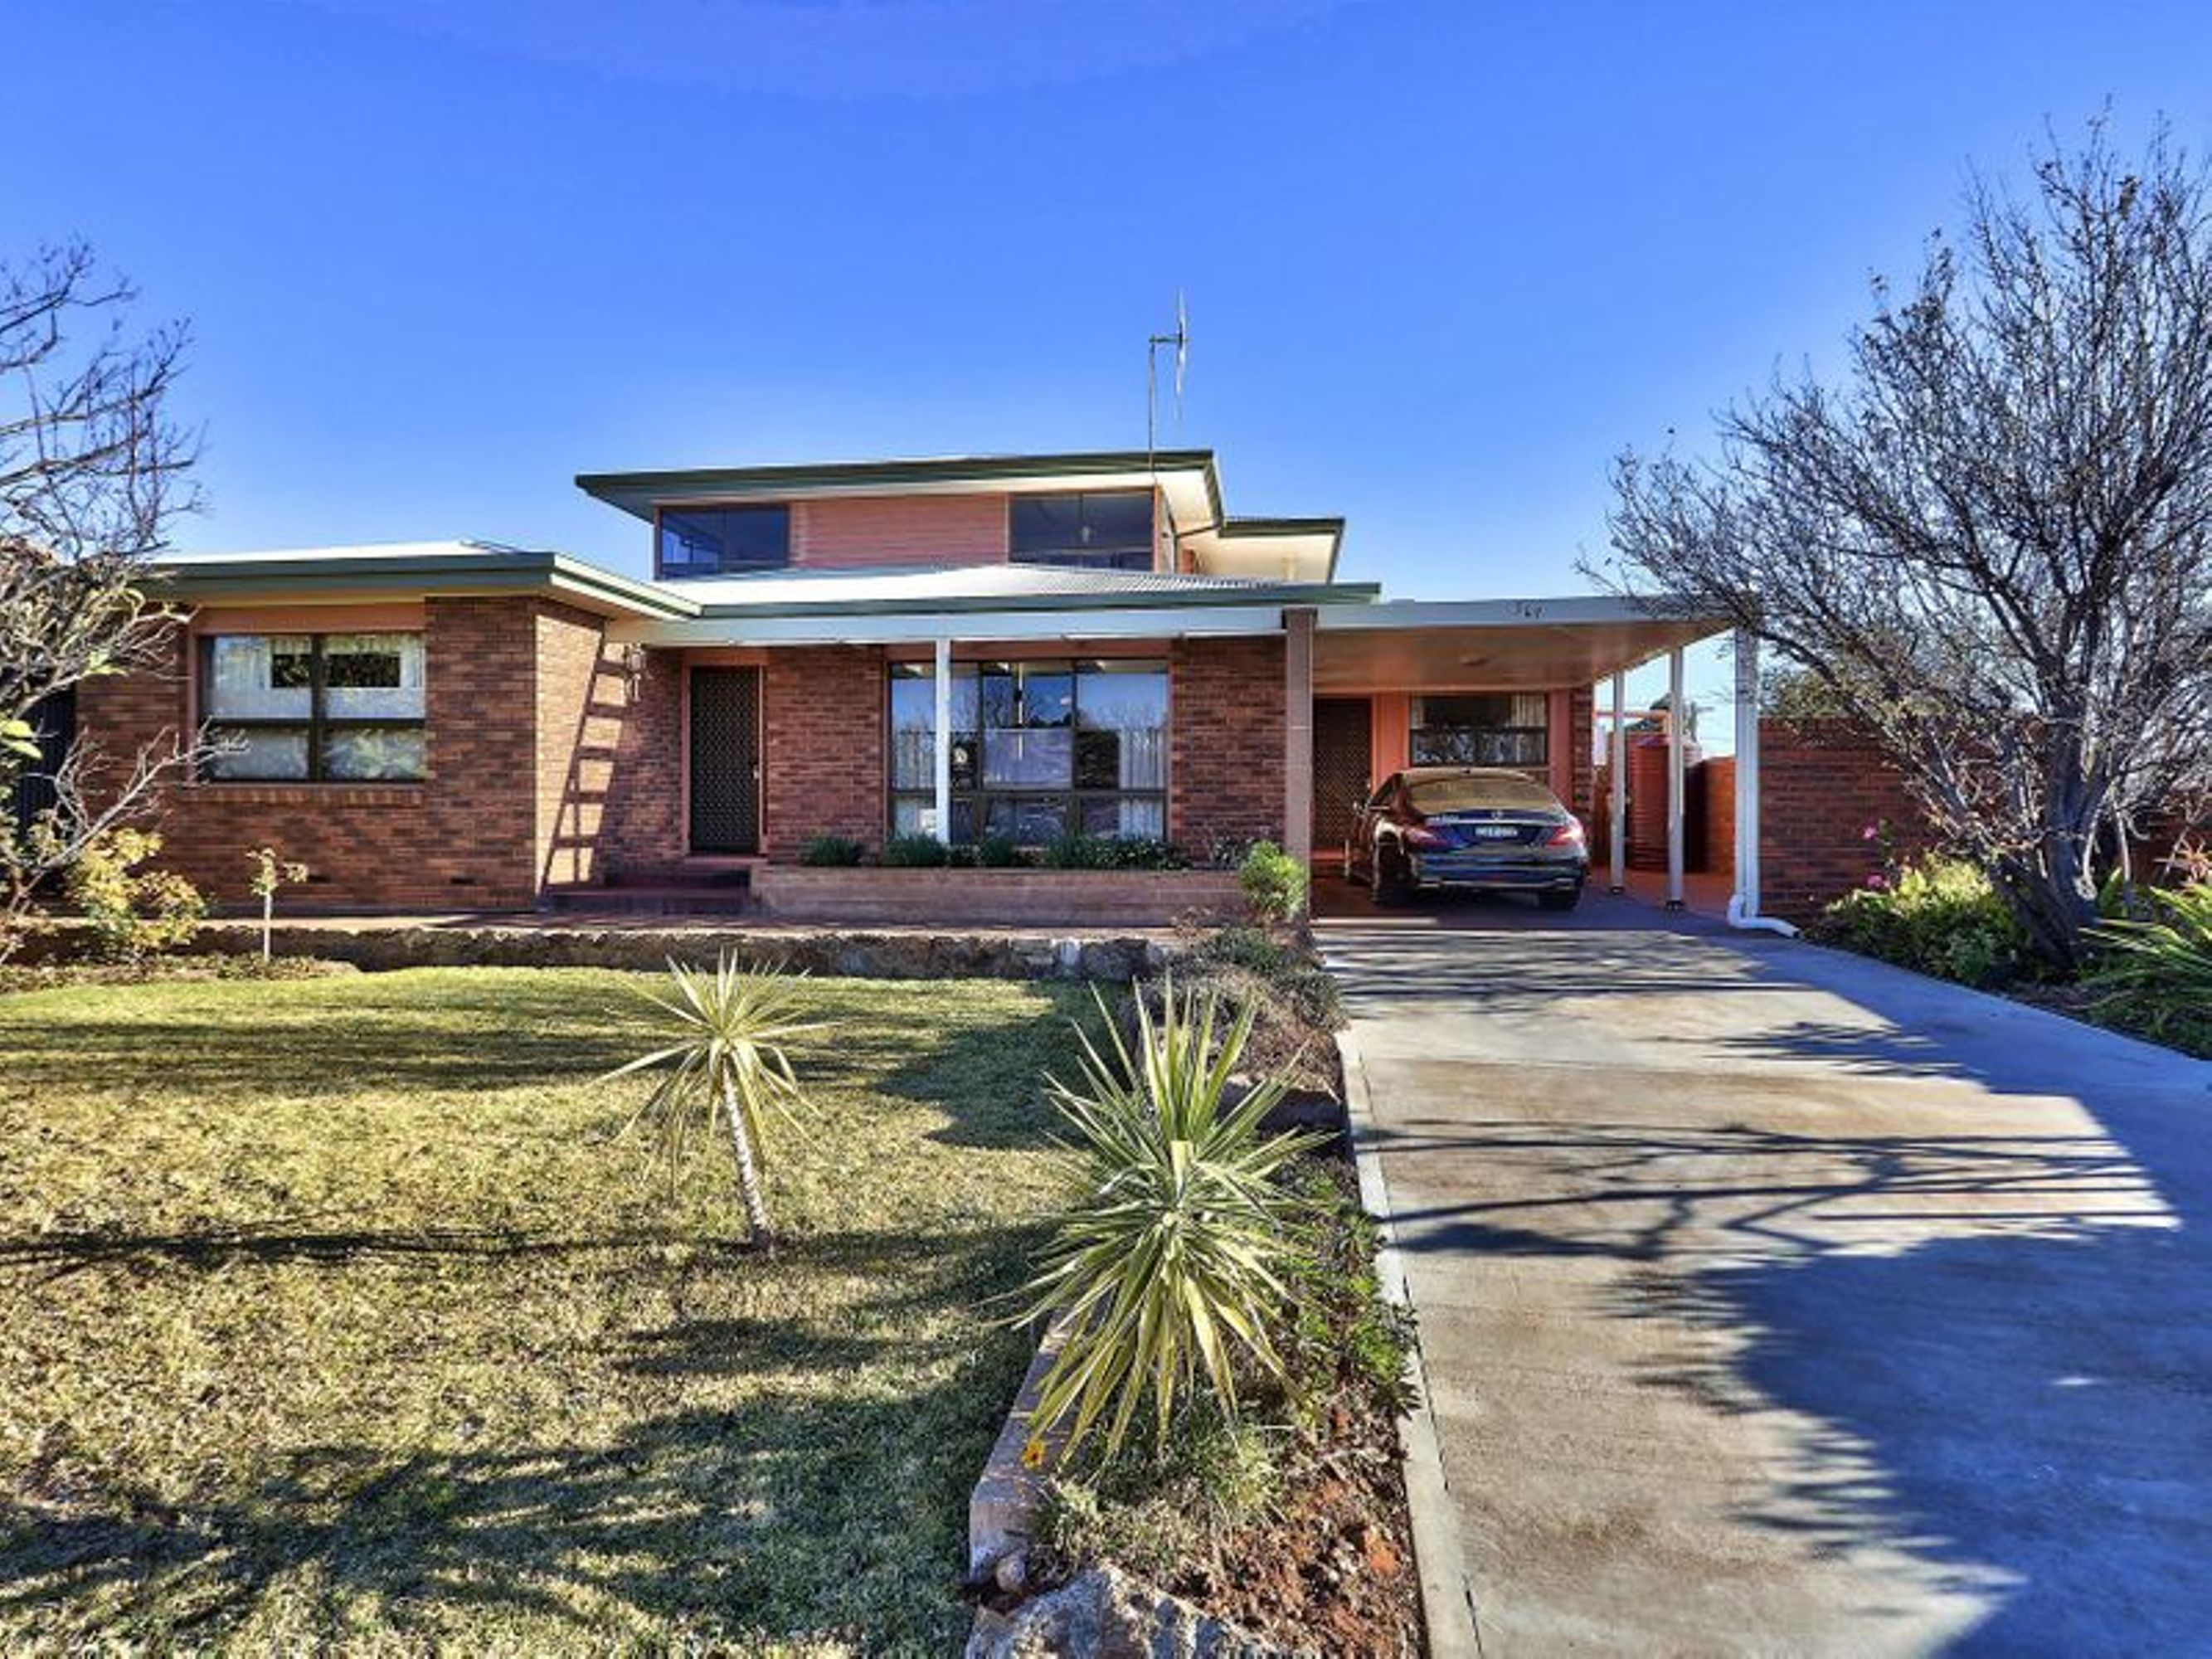 367 McCulloch Street, Broken Hill, NSW 2880